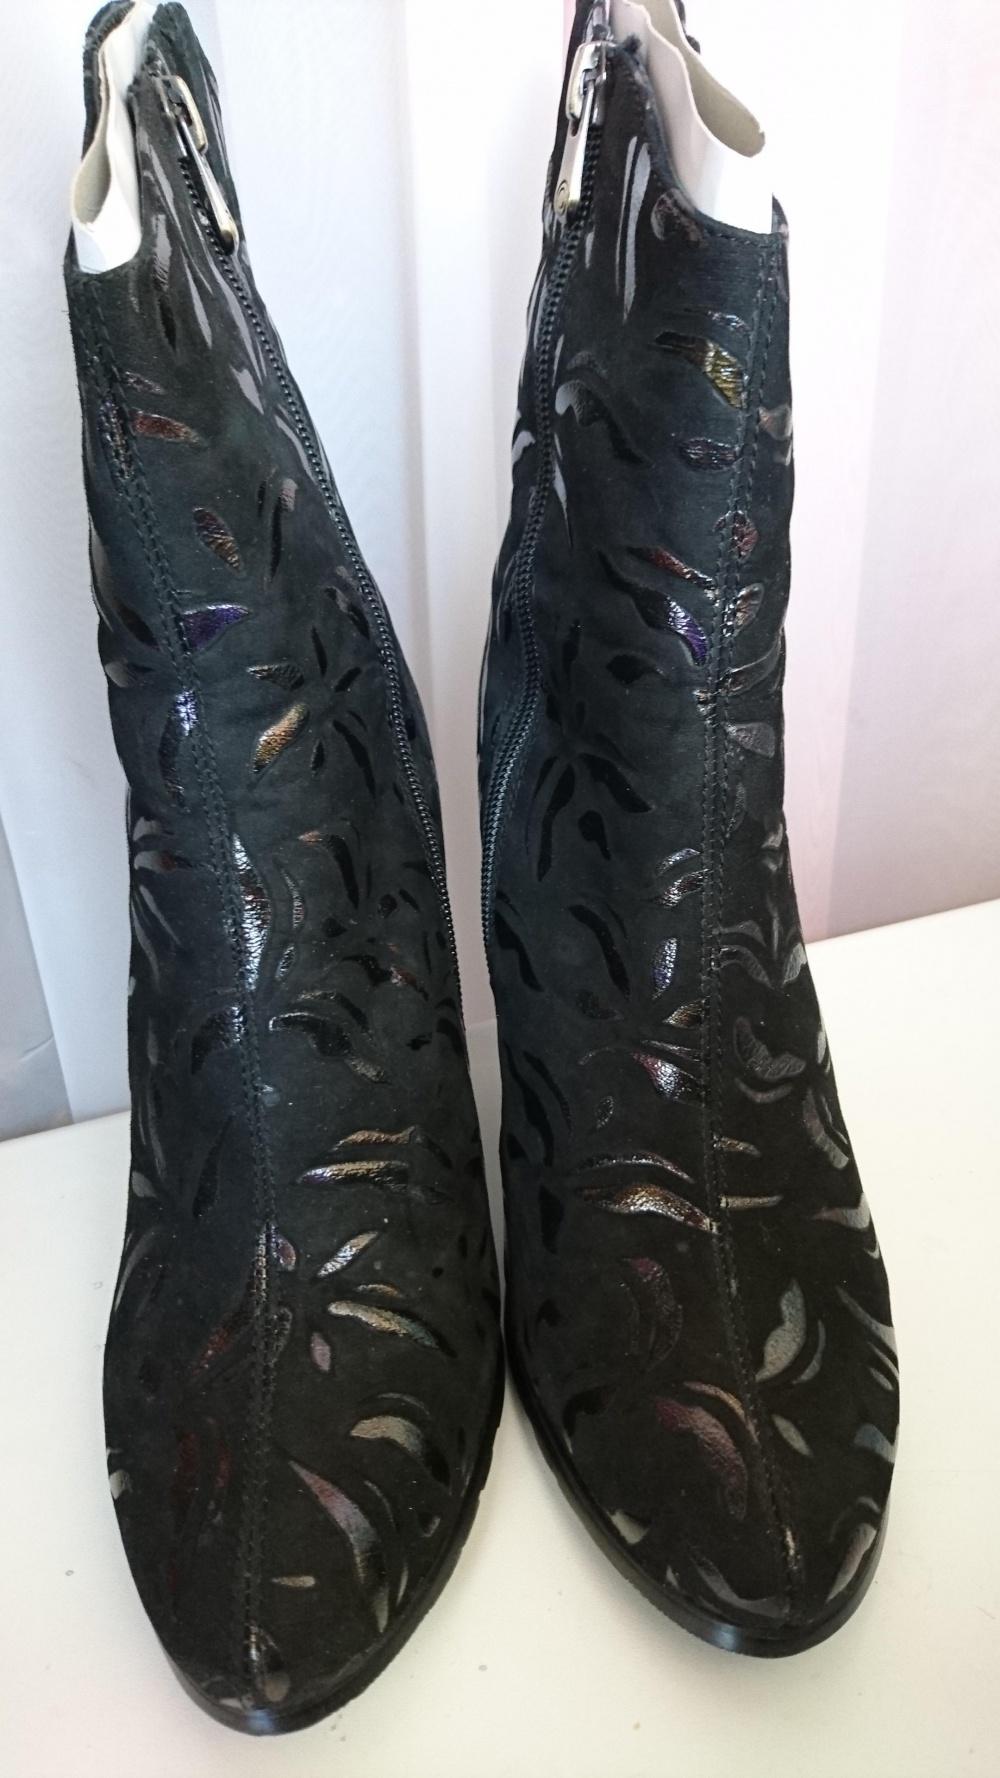 Женские зимние ботинки Carnaby размер 37-38